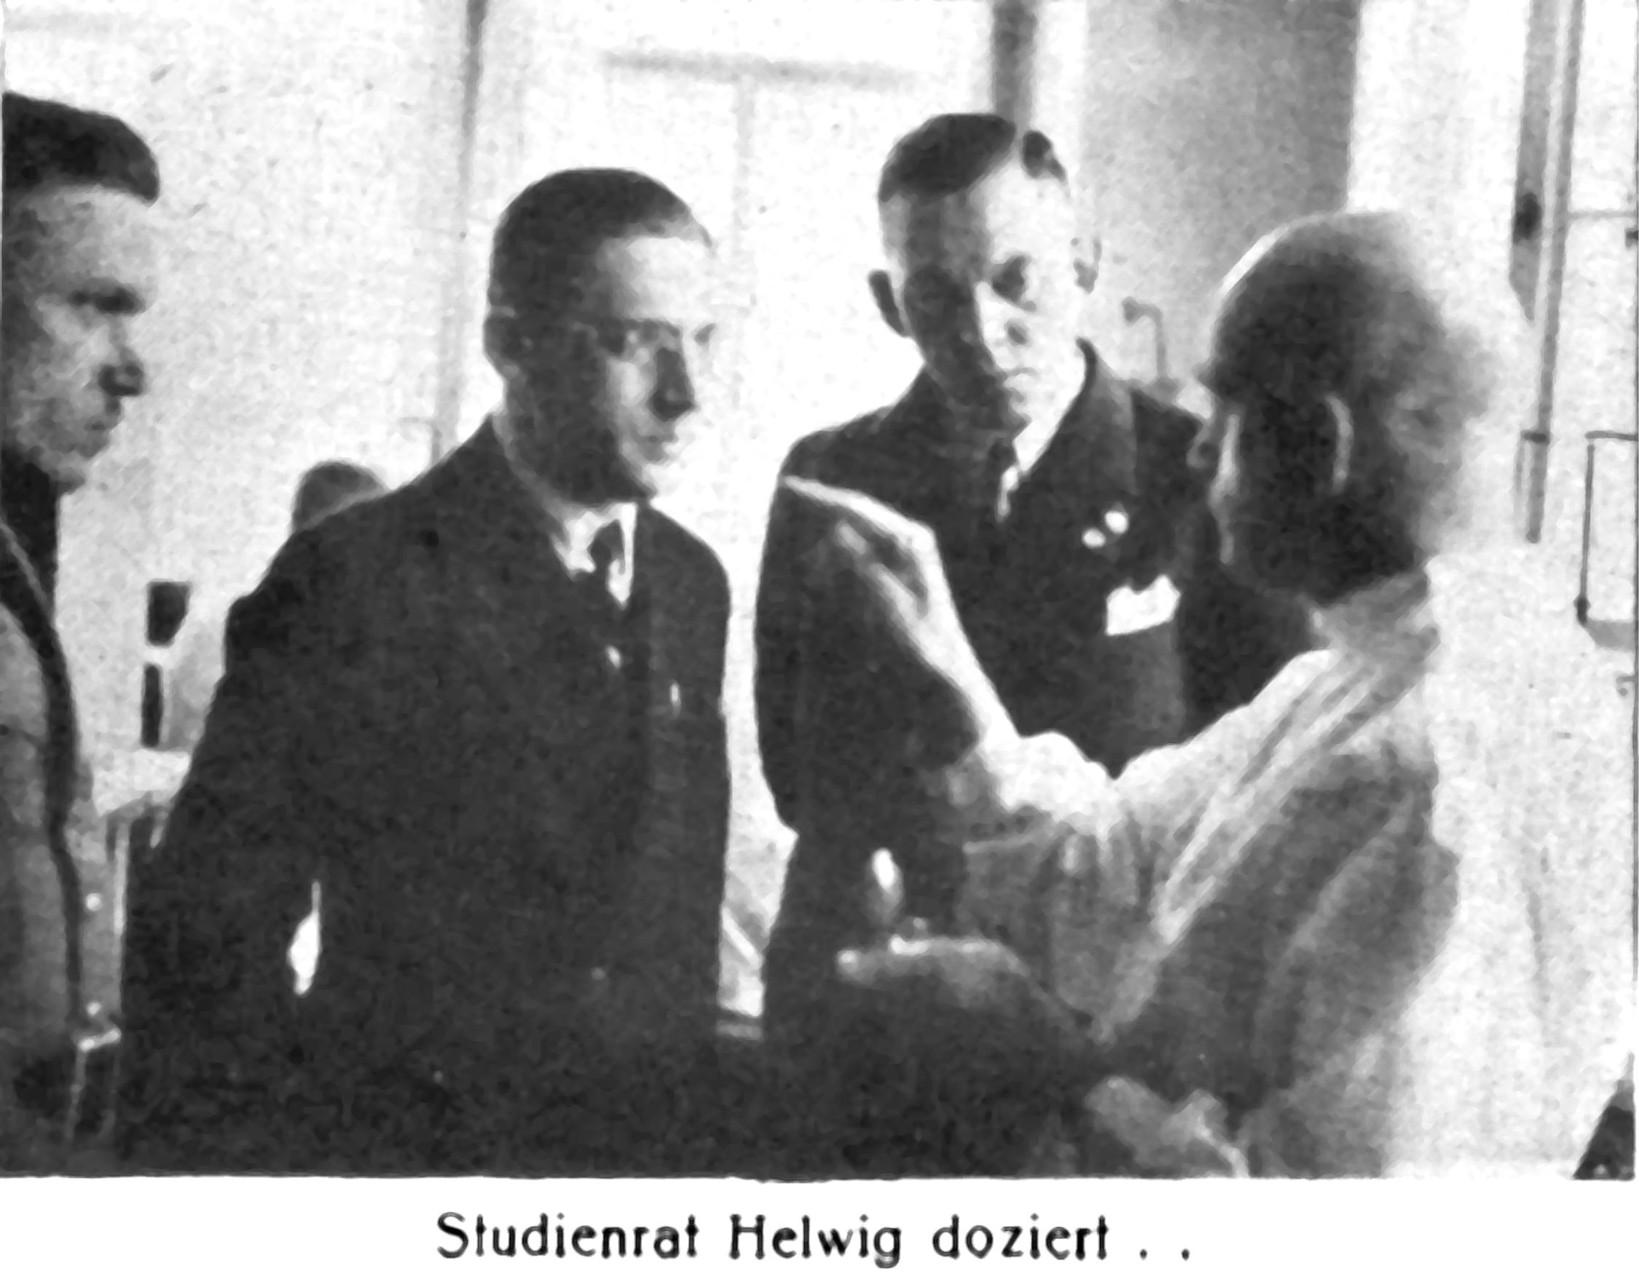 v. r. Studienrat Alfrde Helwig, Reichsinnungsmeister Hans Flügel